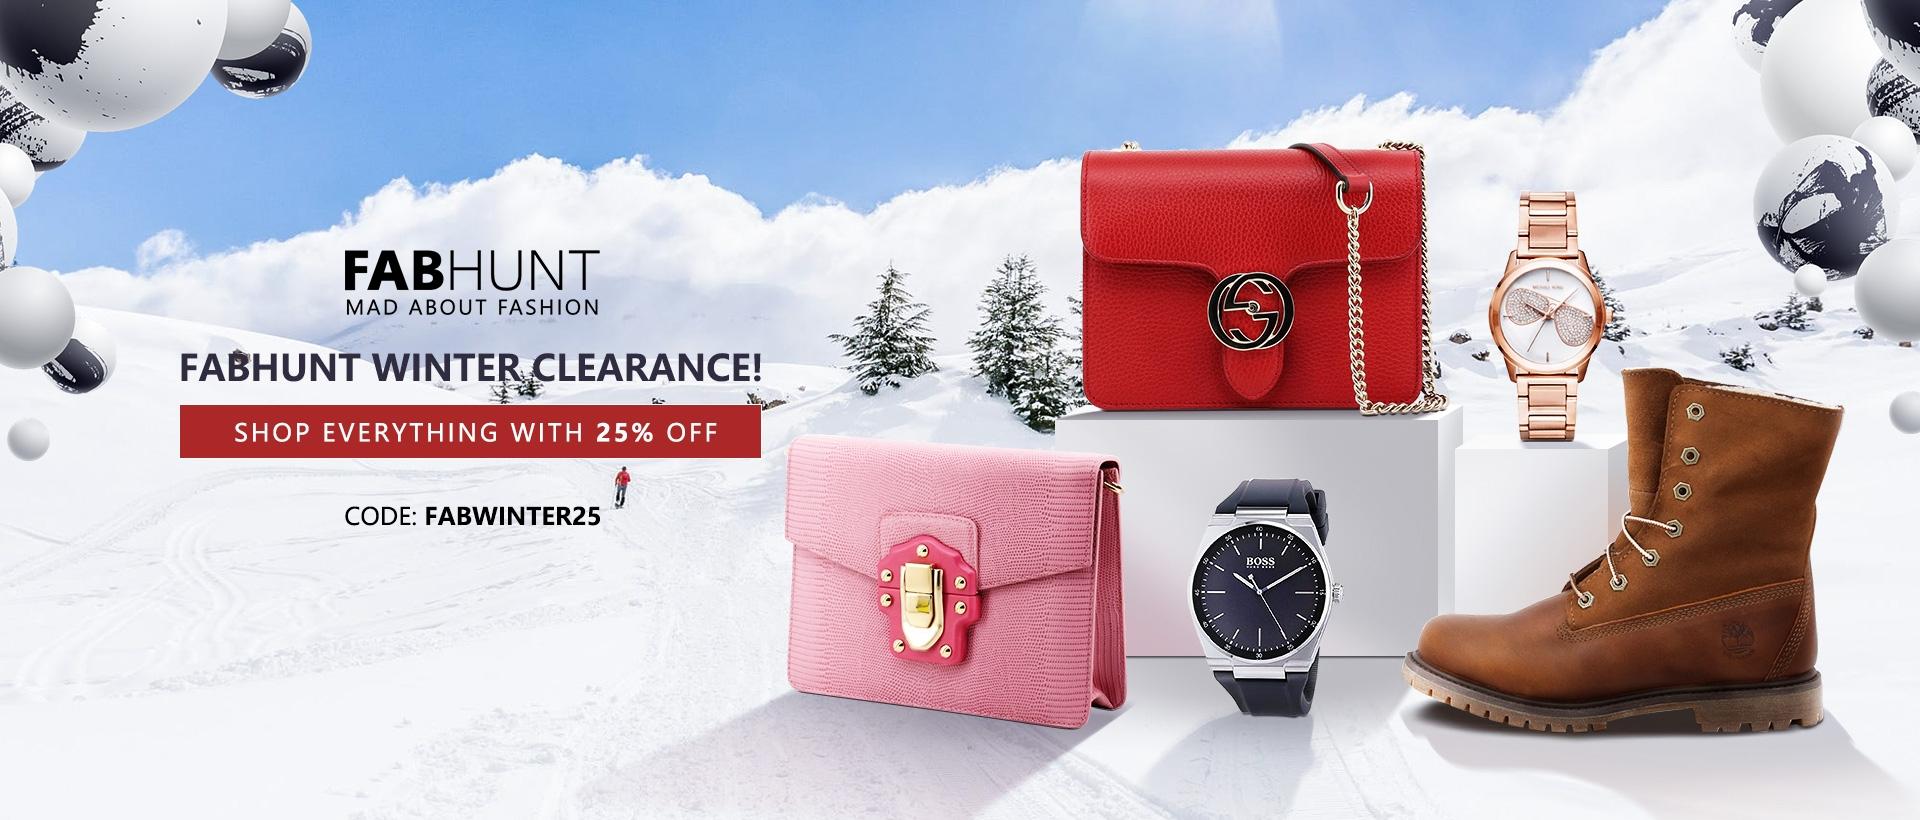 fabhunt-winter-clearance